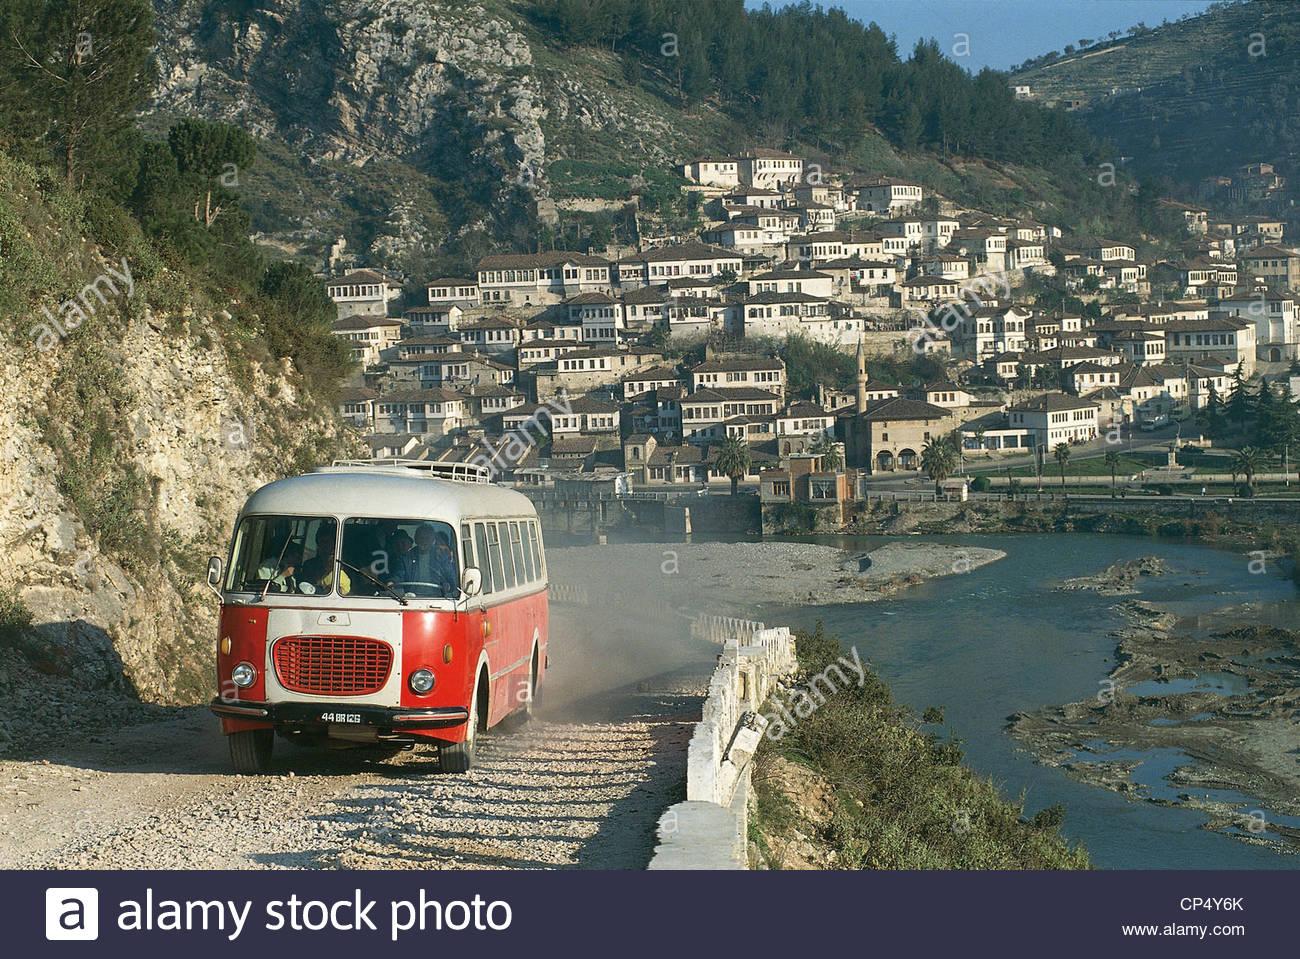 albania-berat-berat-bus-cp4y6k